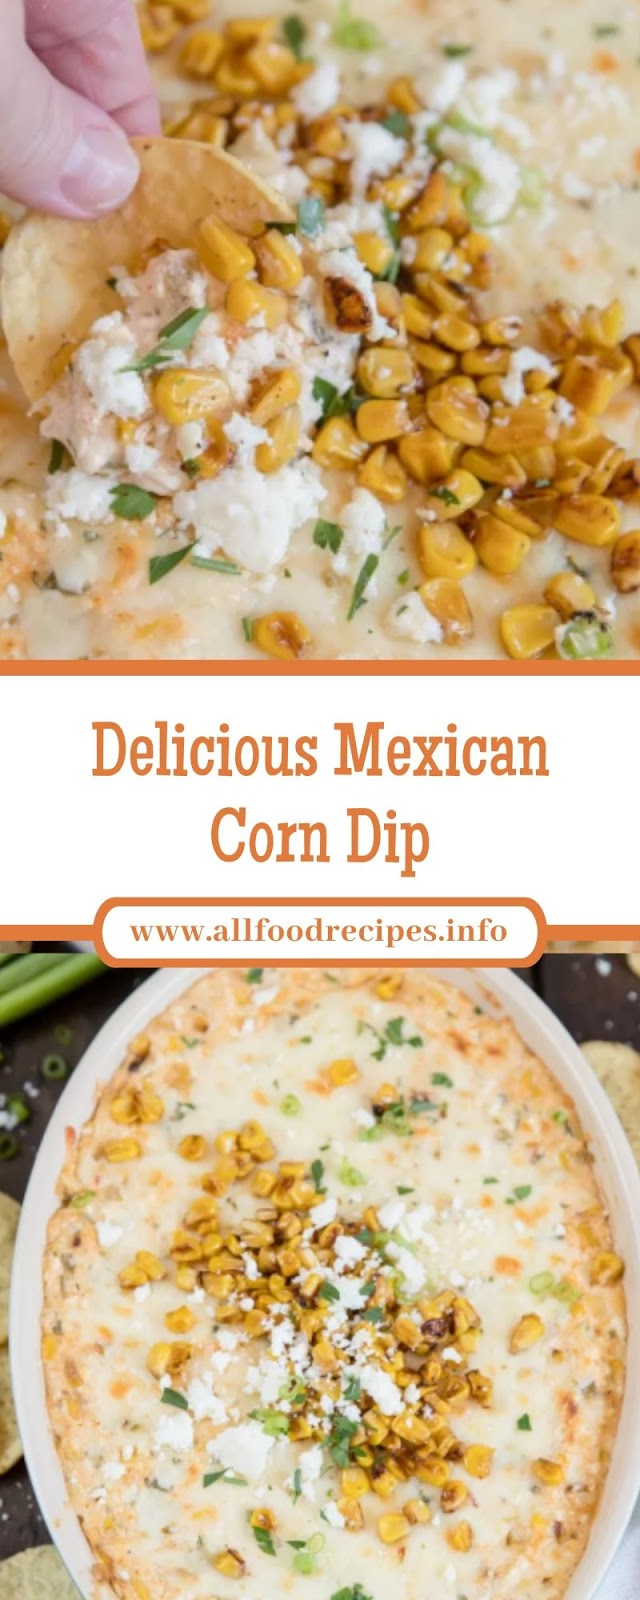 Delicious Mexican Corn Dip